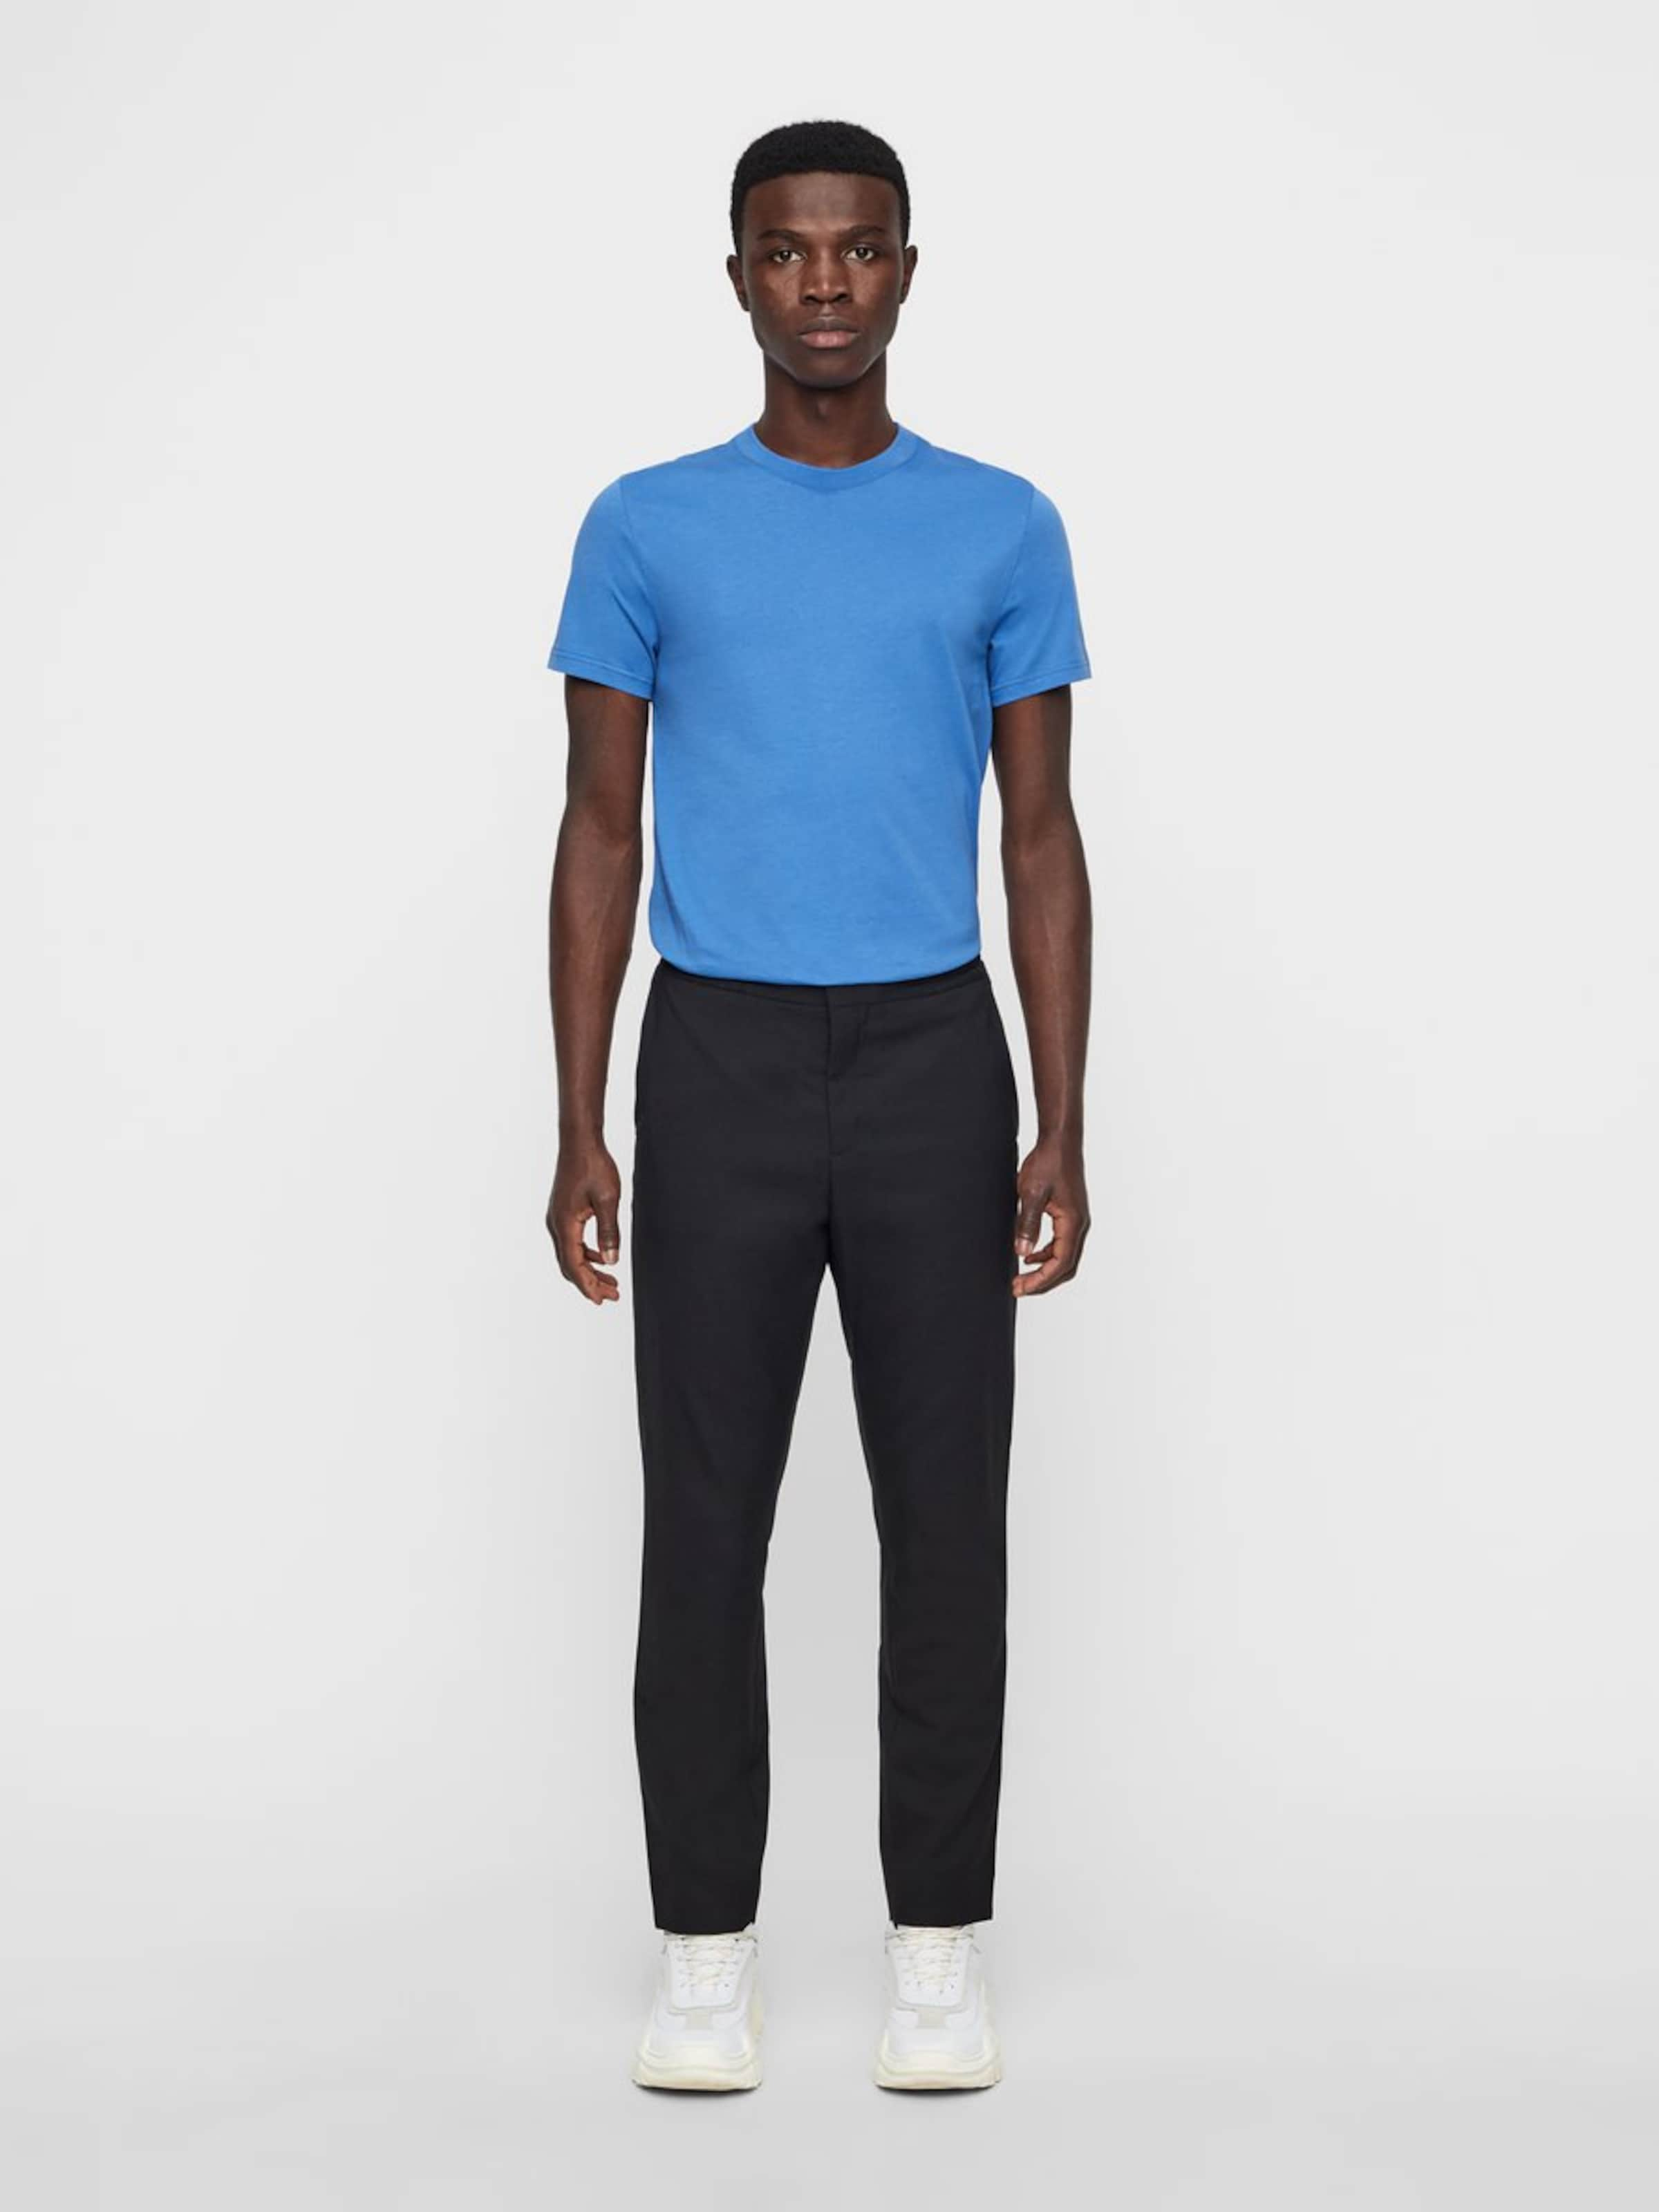 Supima' shirt En lindeberg Bleu J 'silo T Ciel IYf6y7gvb